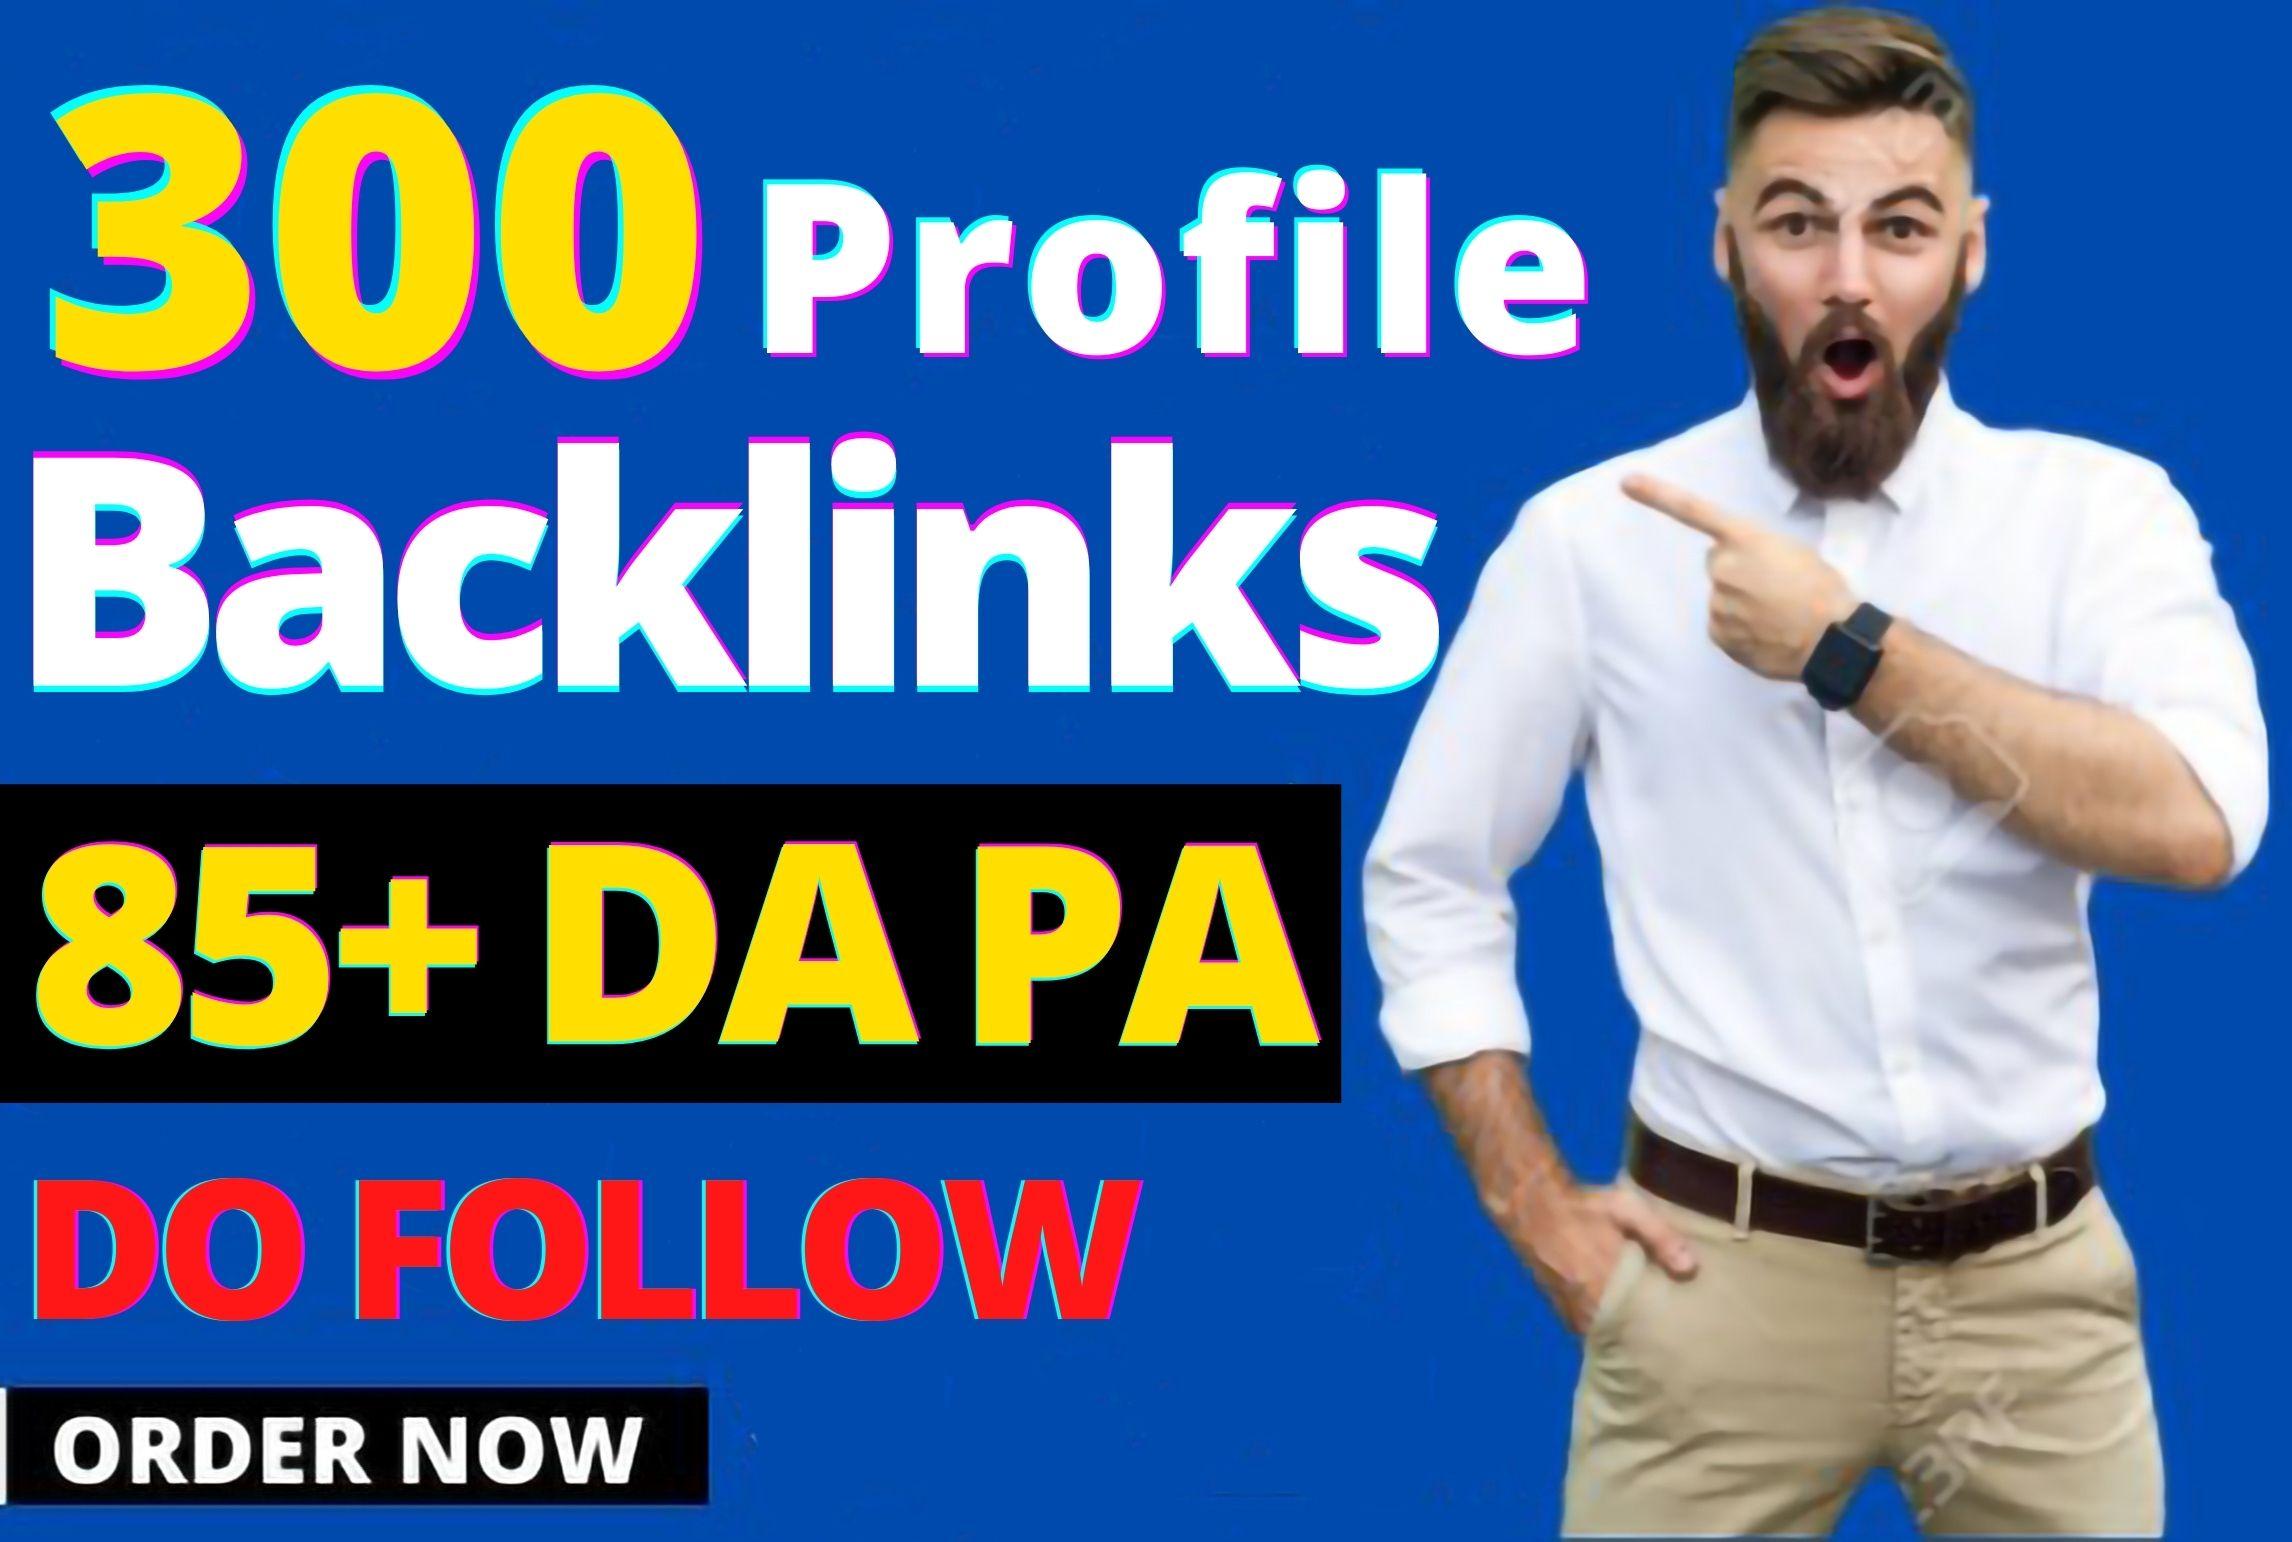 I will create 300 Dofollow DA PA 85+ PR-9 Profile Backlinks Creation for SEO Ranking